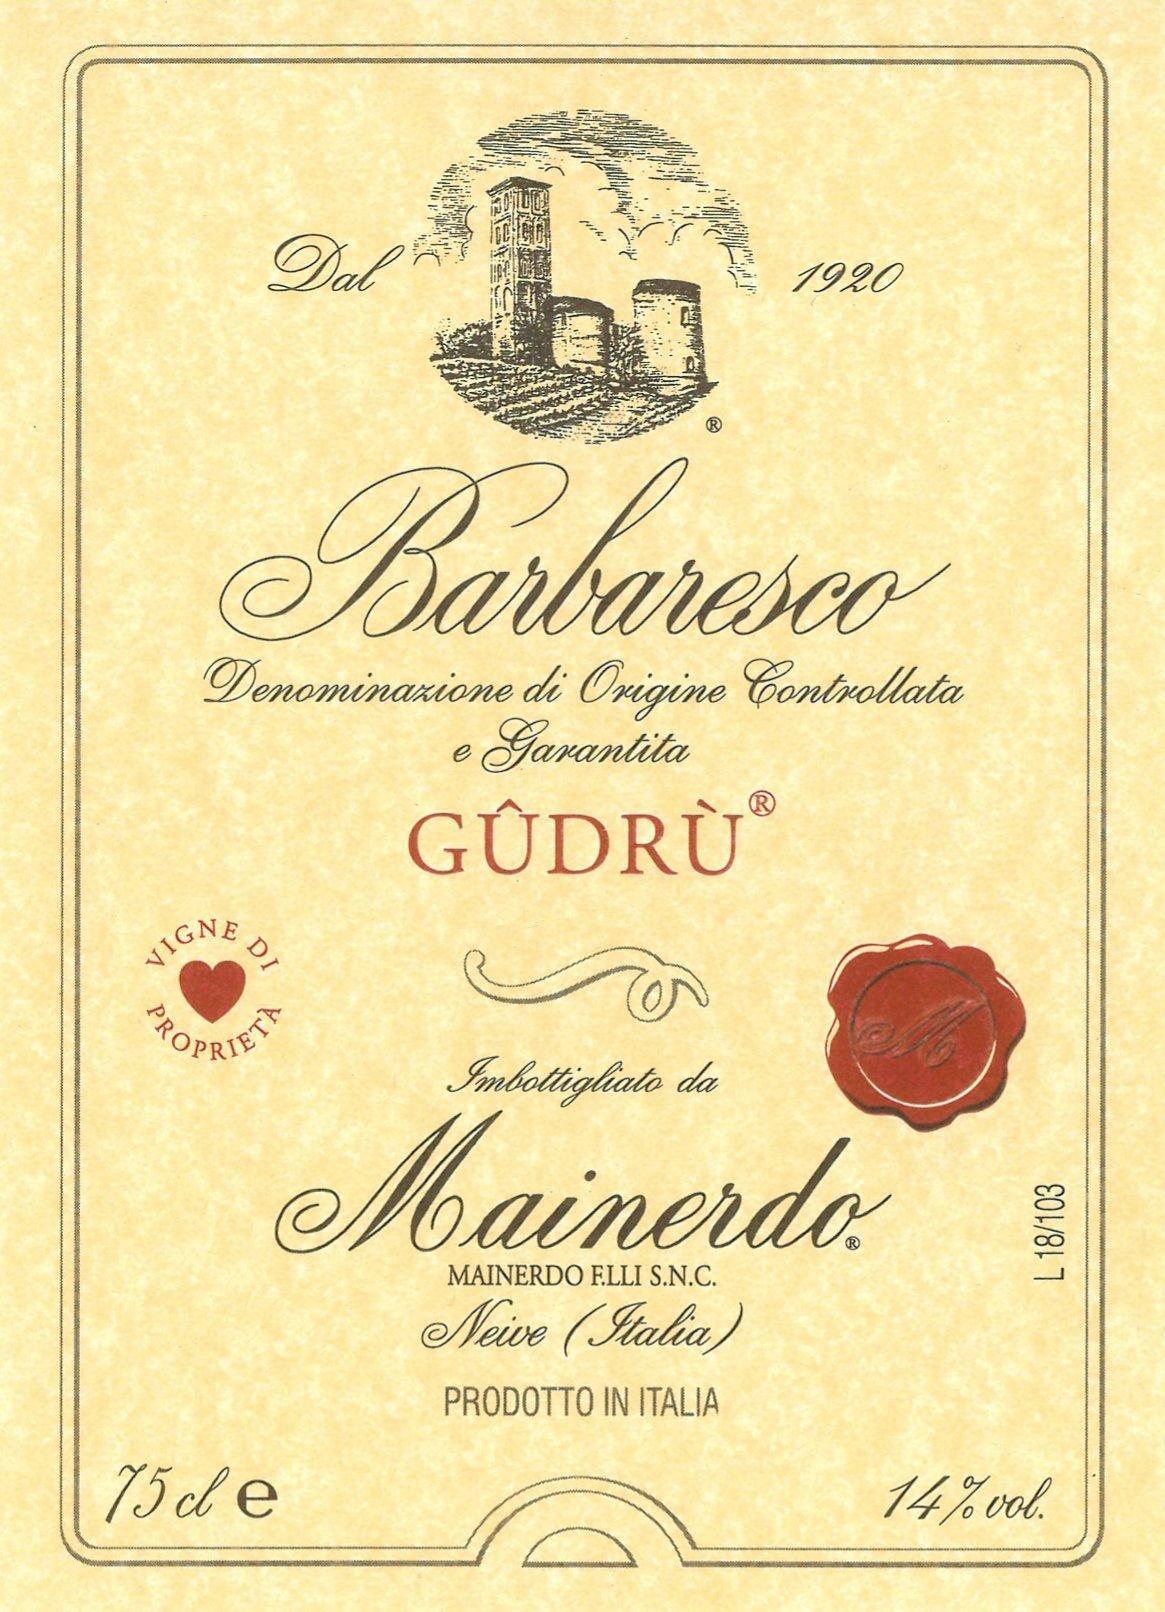 Barbaresco Gudrù – Cottà